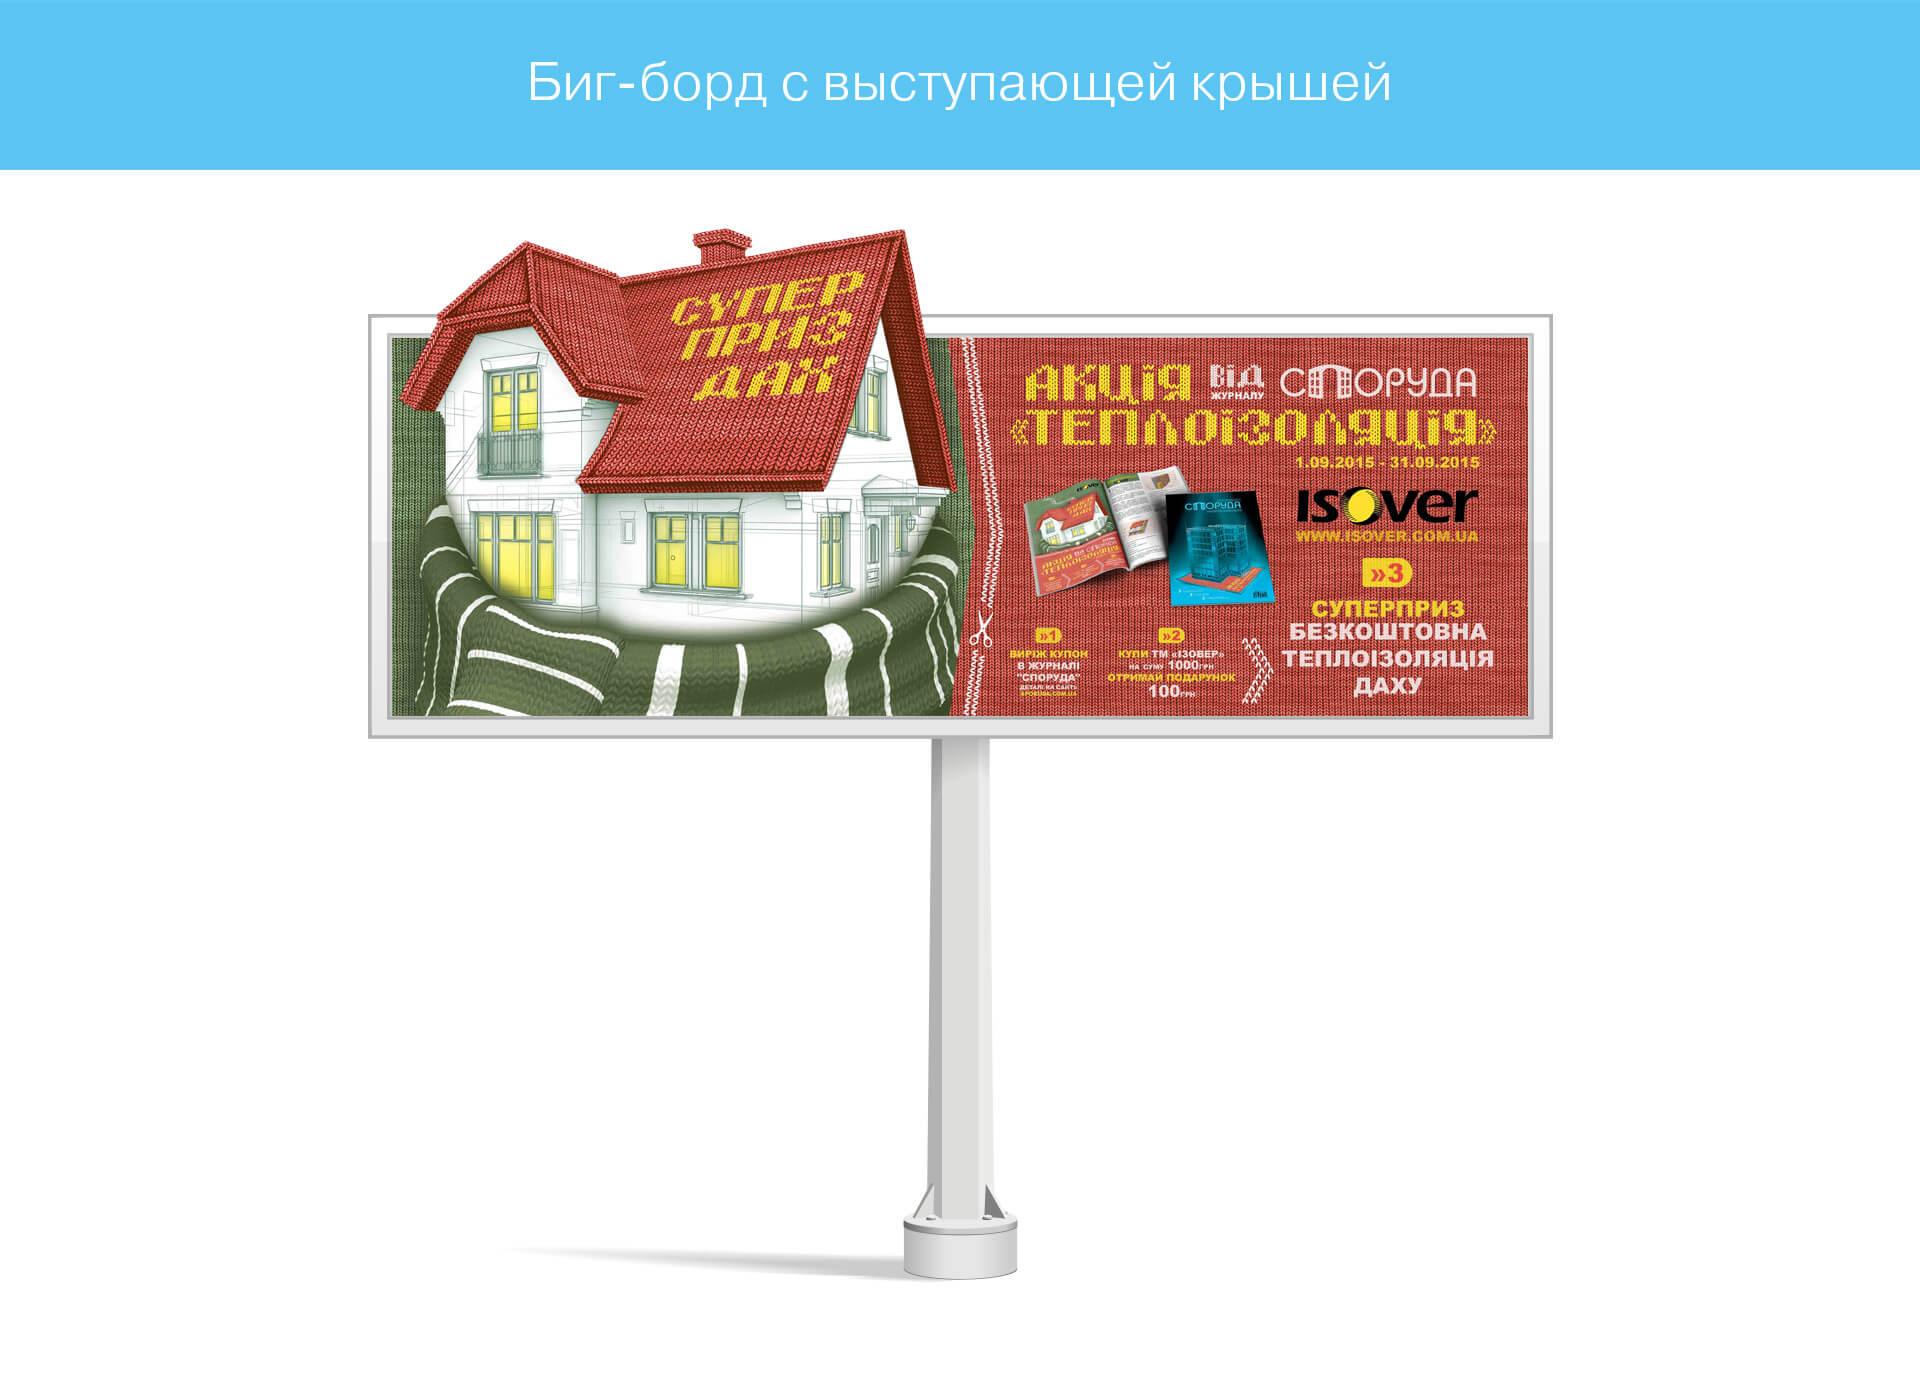 Prokochuk_Irina_architectural magazine Sporuda_аdvertising campaign_4